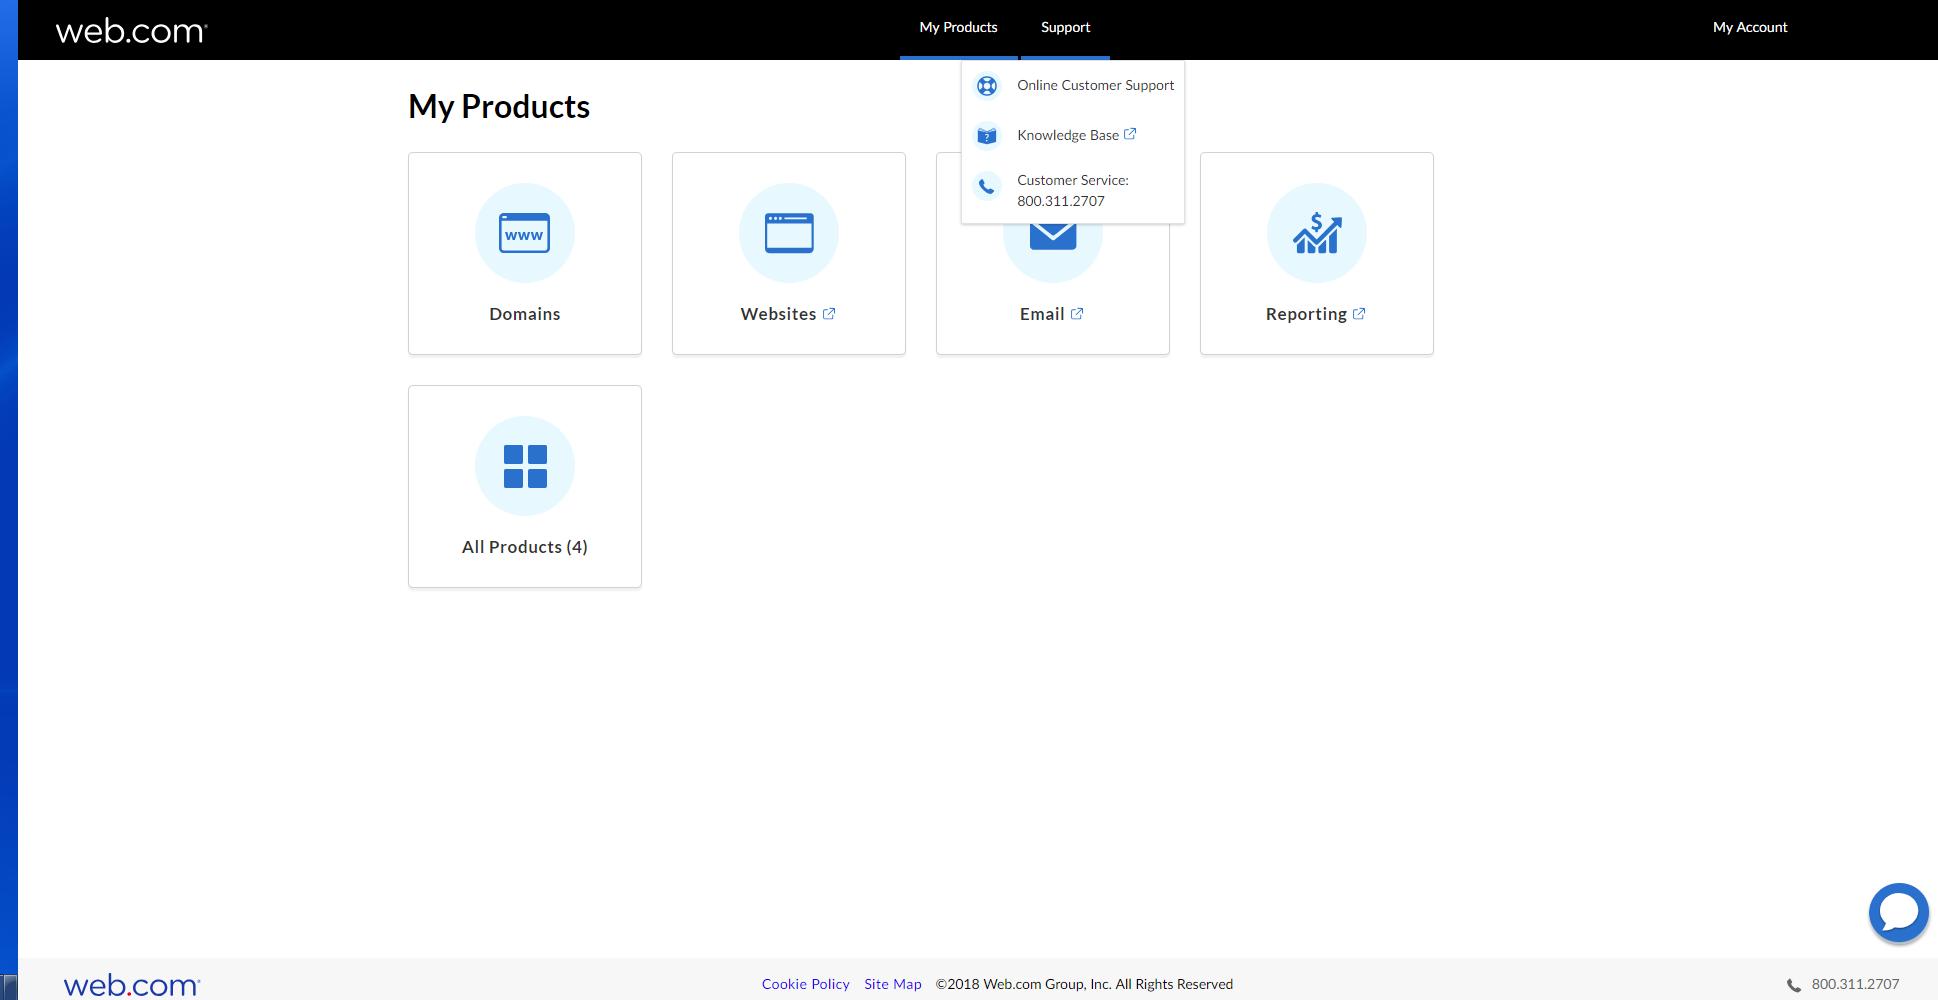 web.com support options